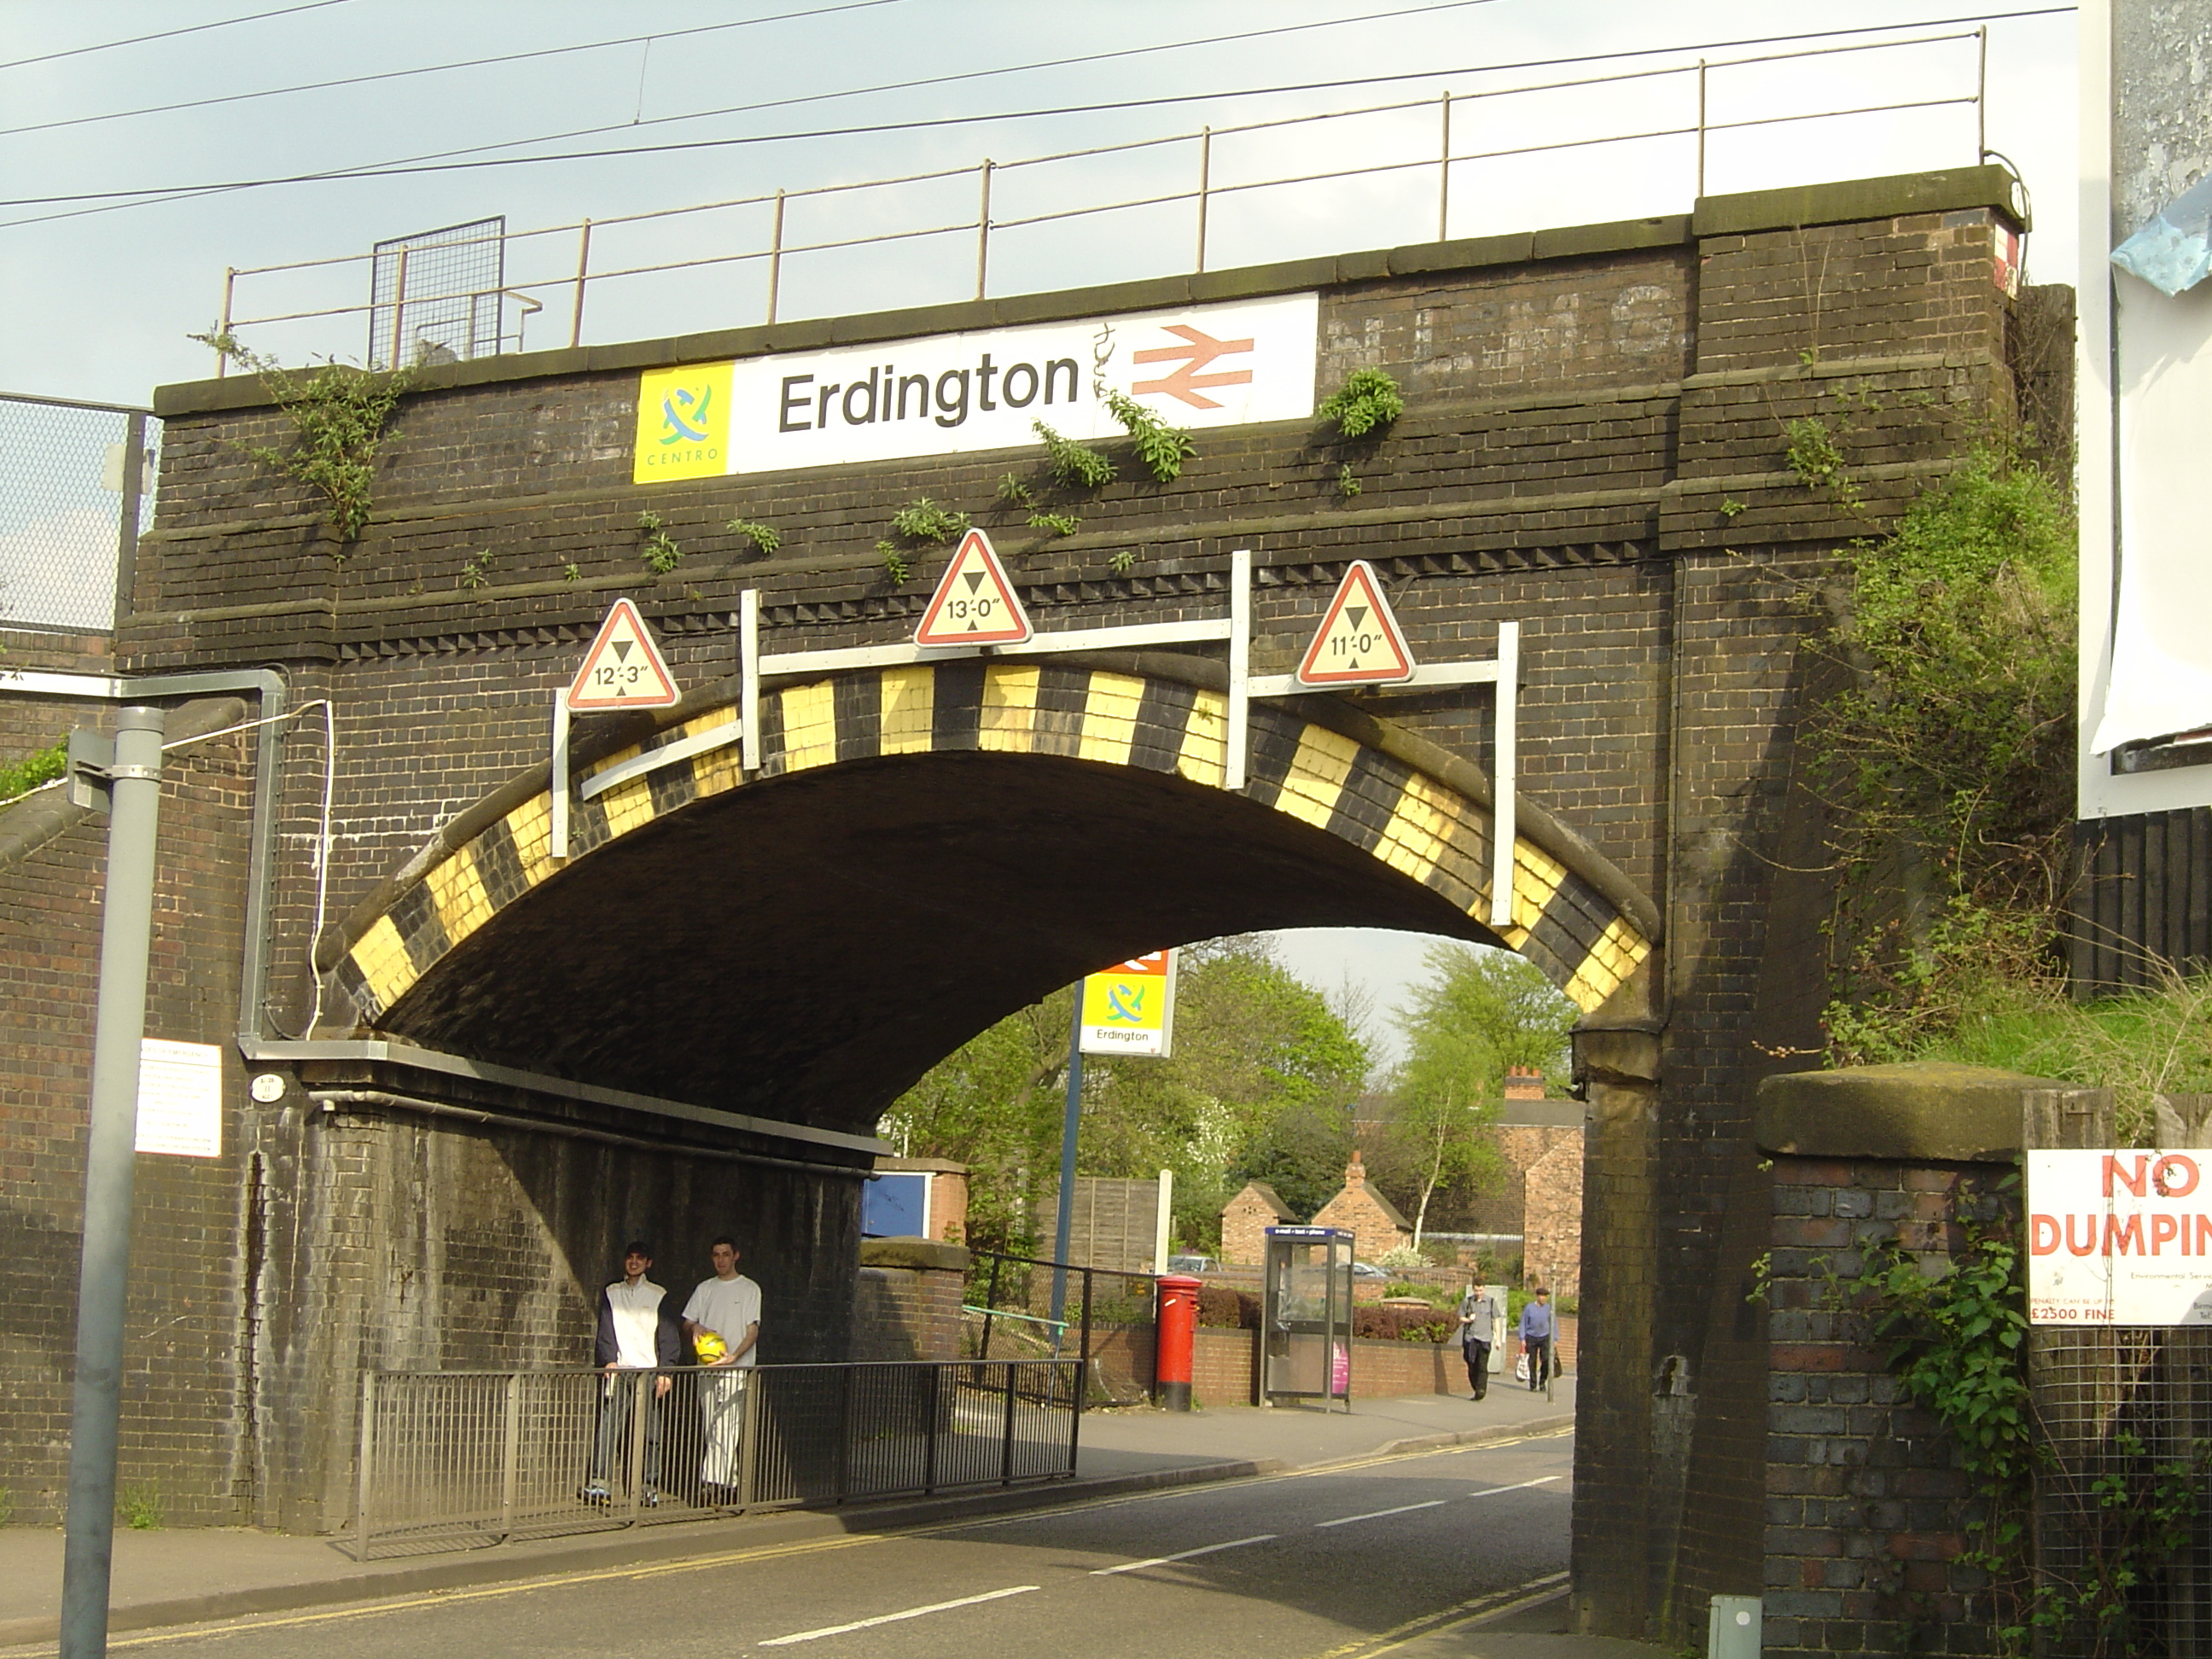 File:Erdington bridge - 2006-05-04.jpg - Wikimedia Commons: http://commons.wikimedia.org/wiki/file:erdington_bridge_-_2006-05-04.jpg